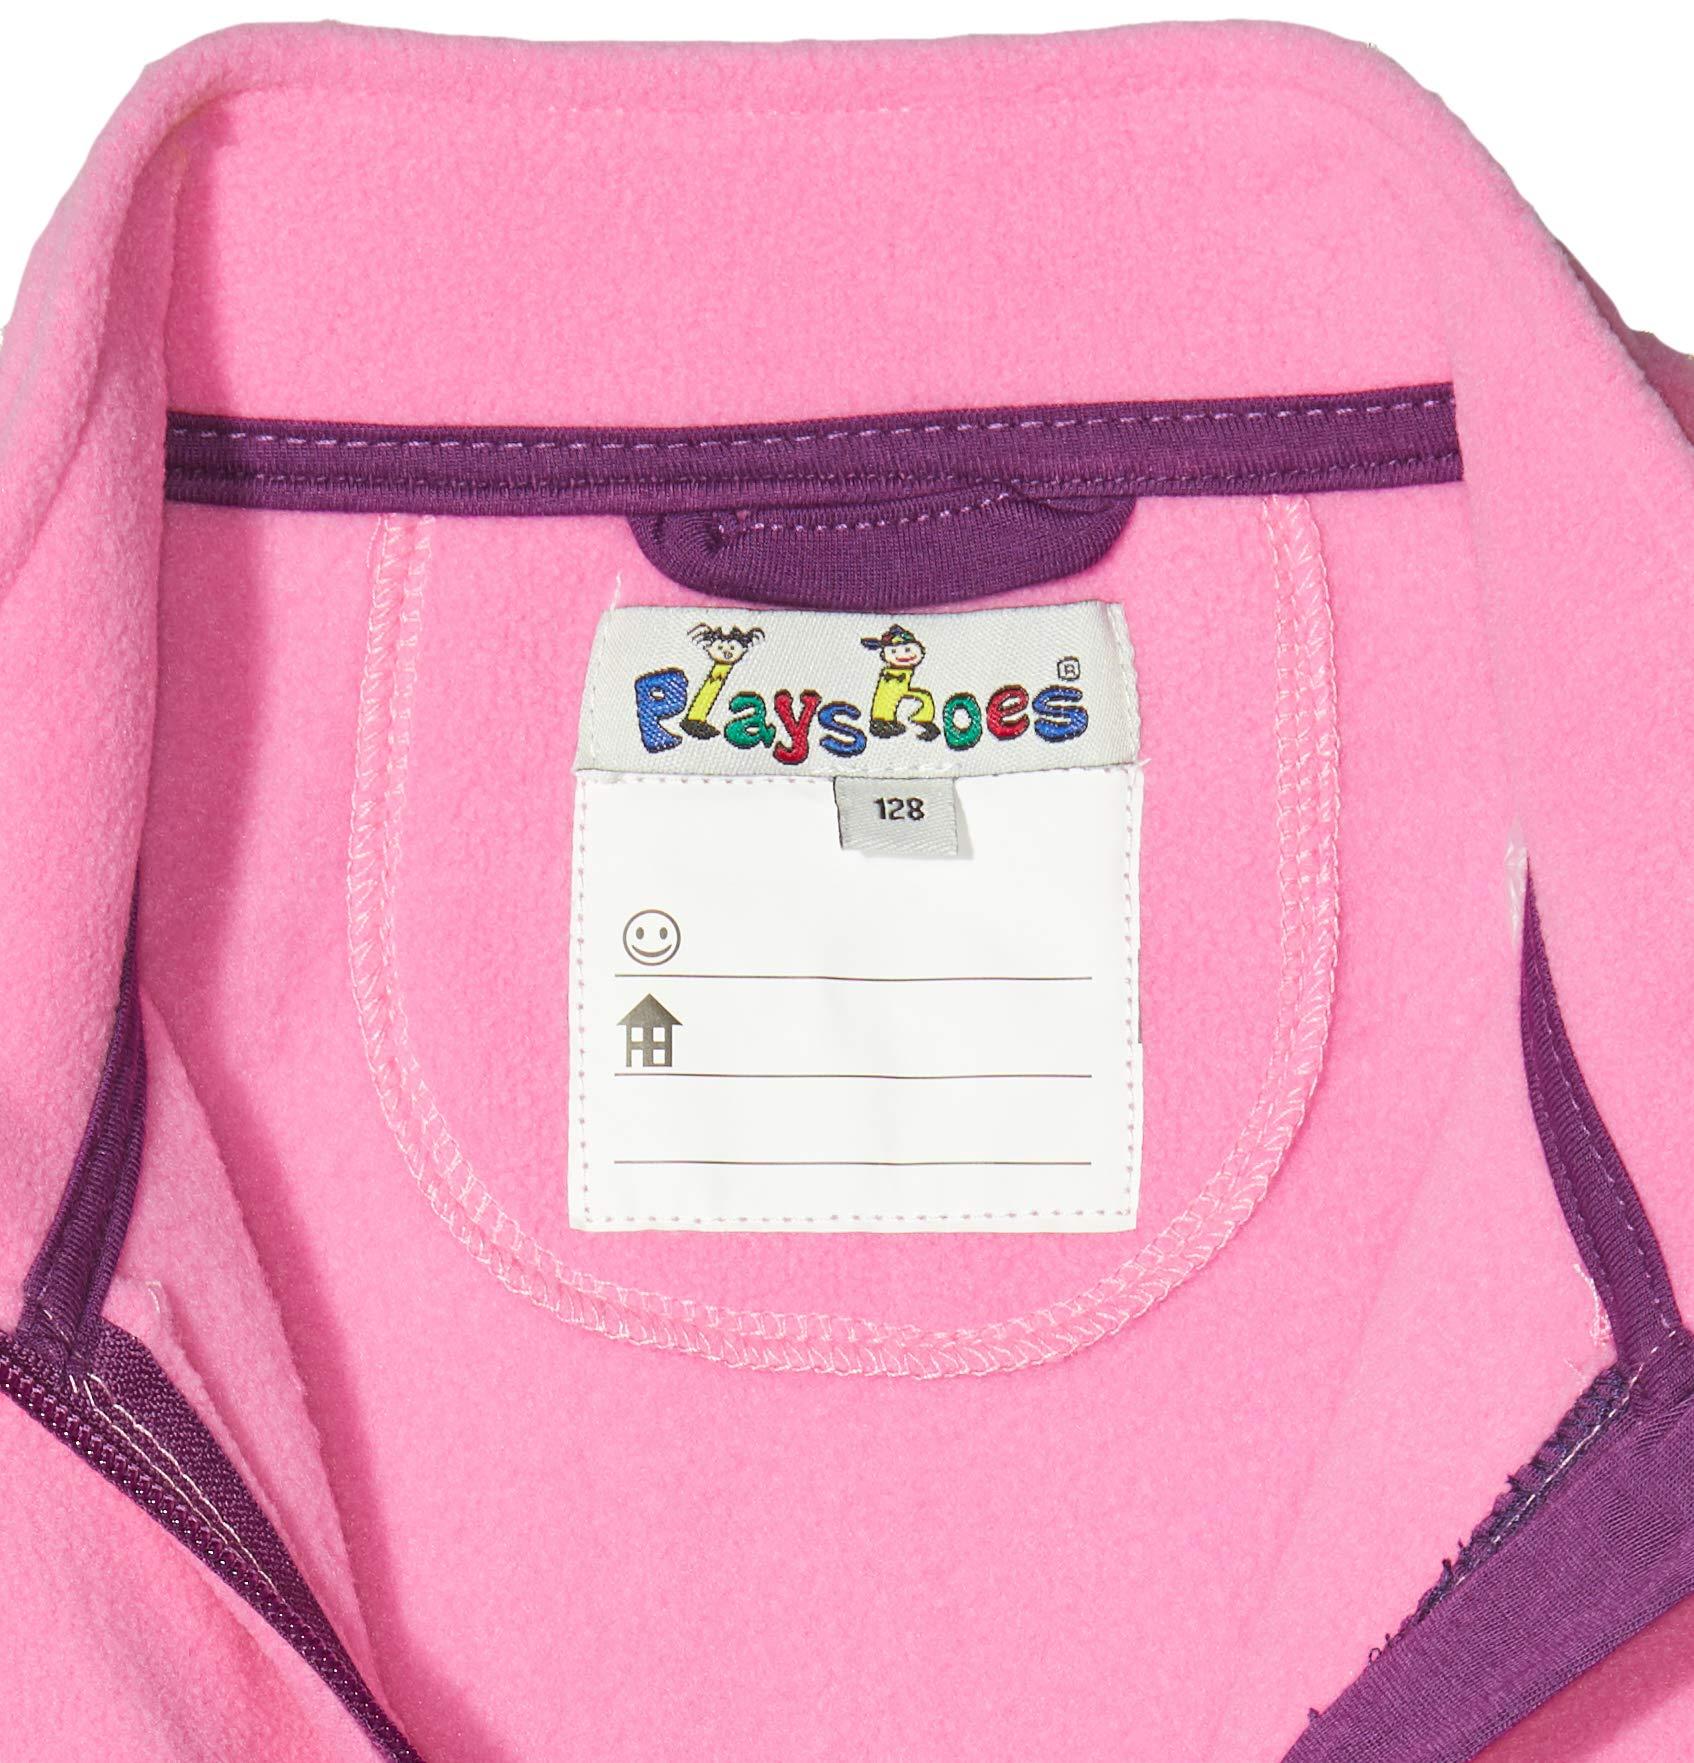 Playshoes Fleece-Weste Farbig Abgesetzt Chaleco para Niñas 3